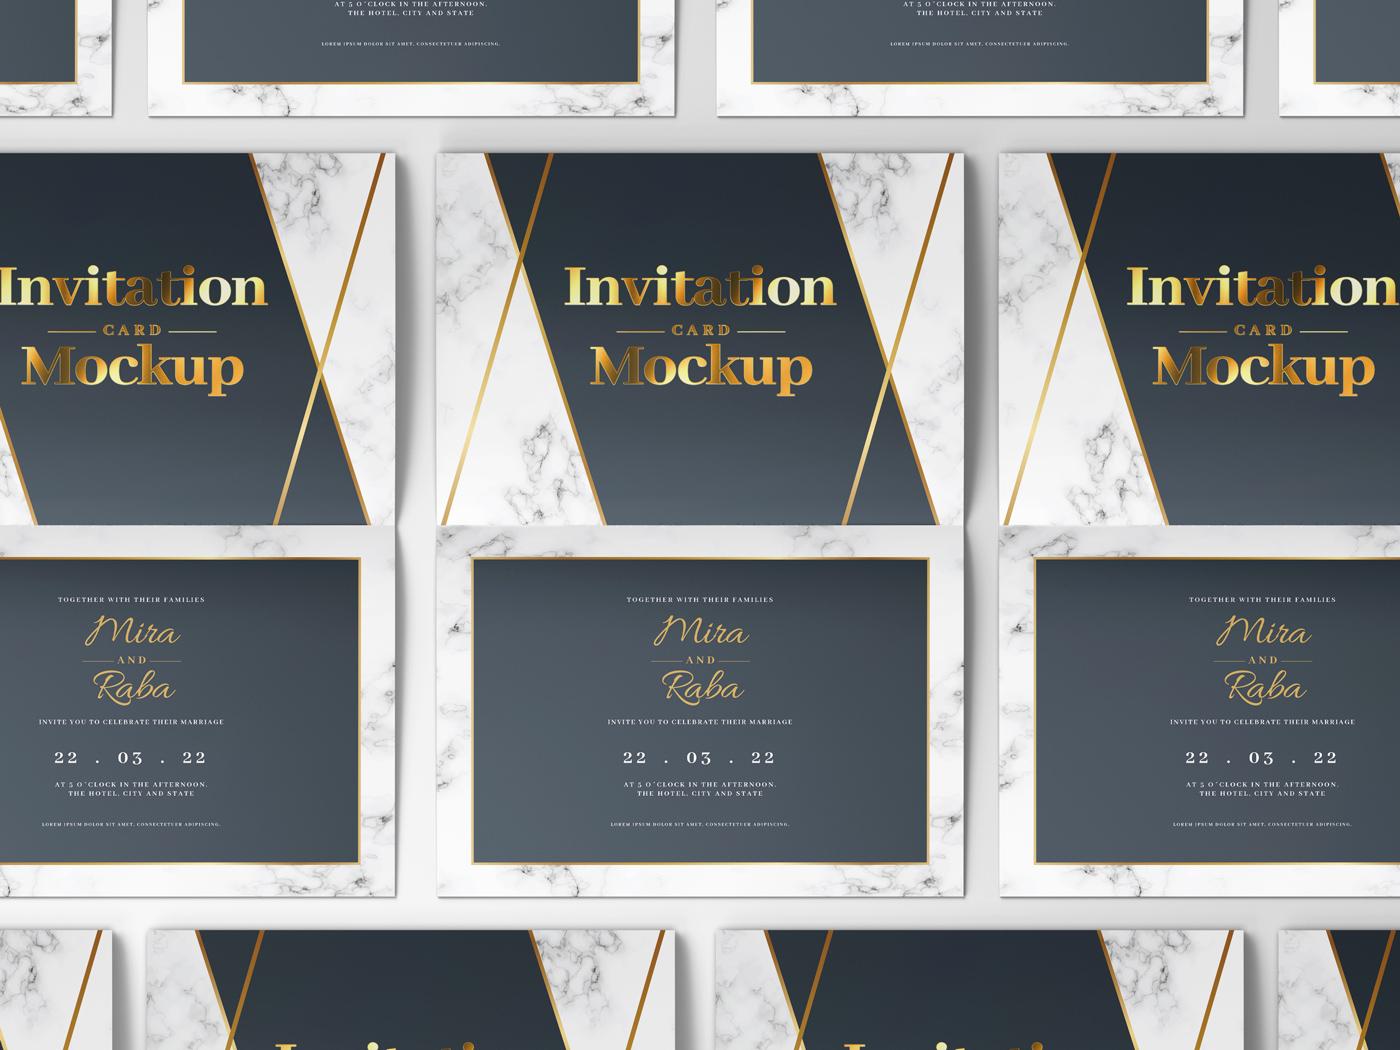 Invitation Card Mockups V1 example image 12